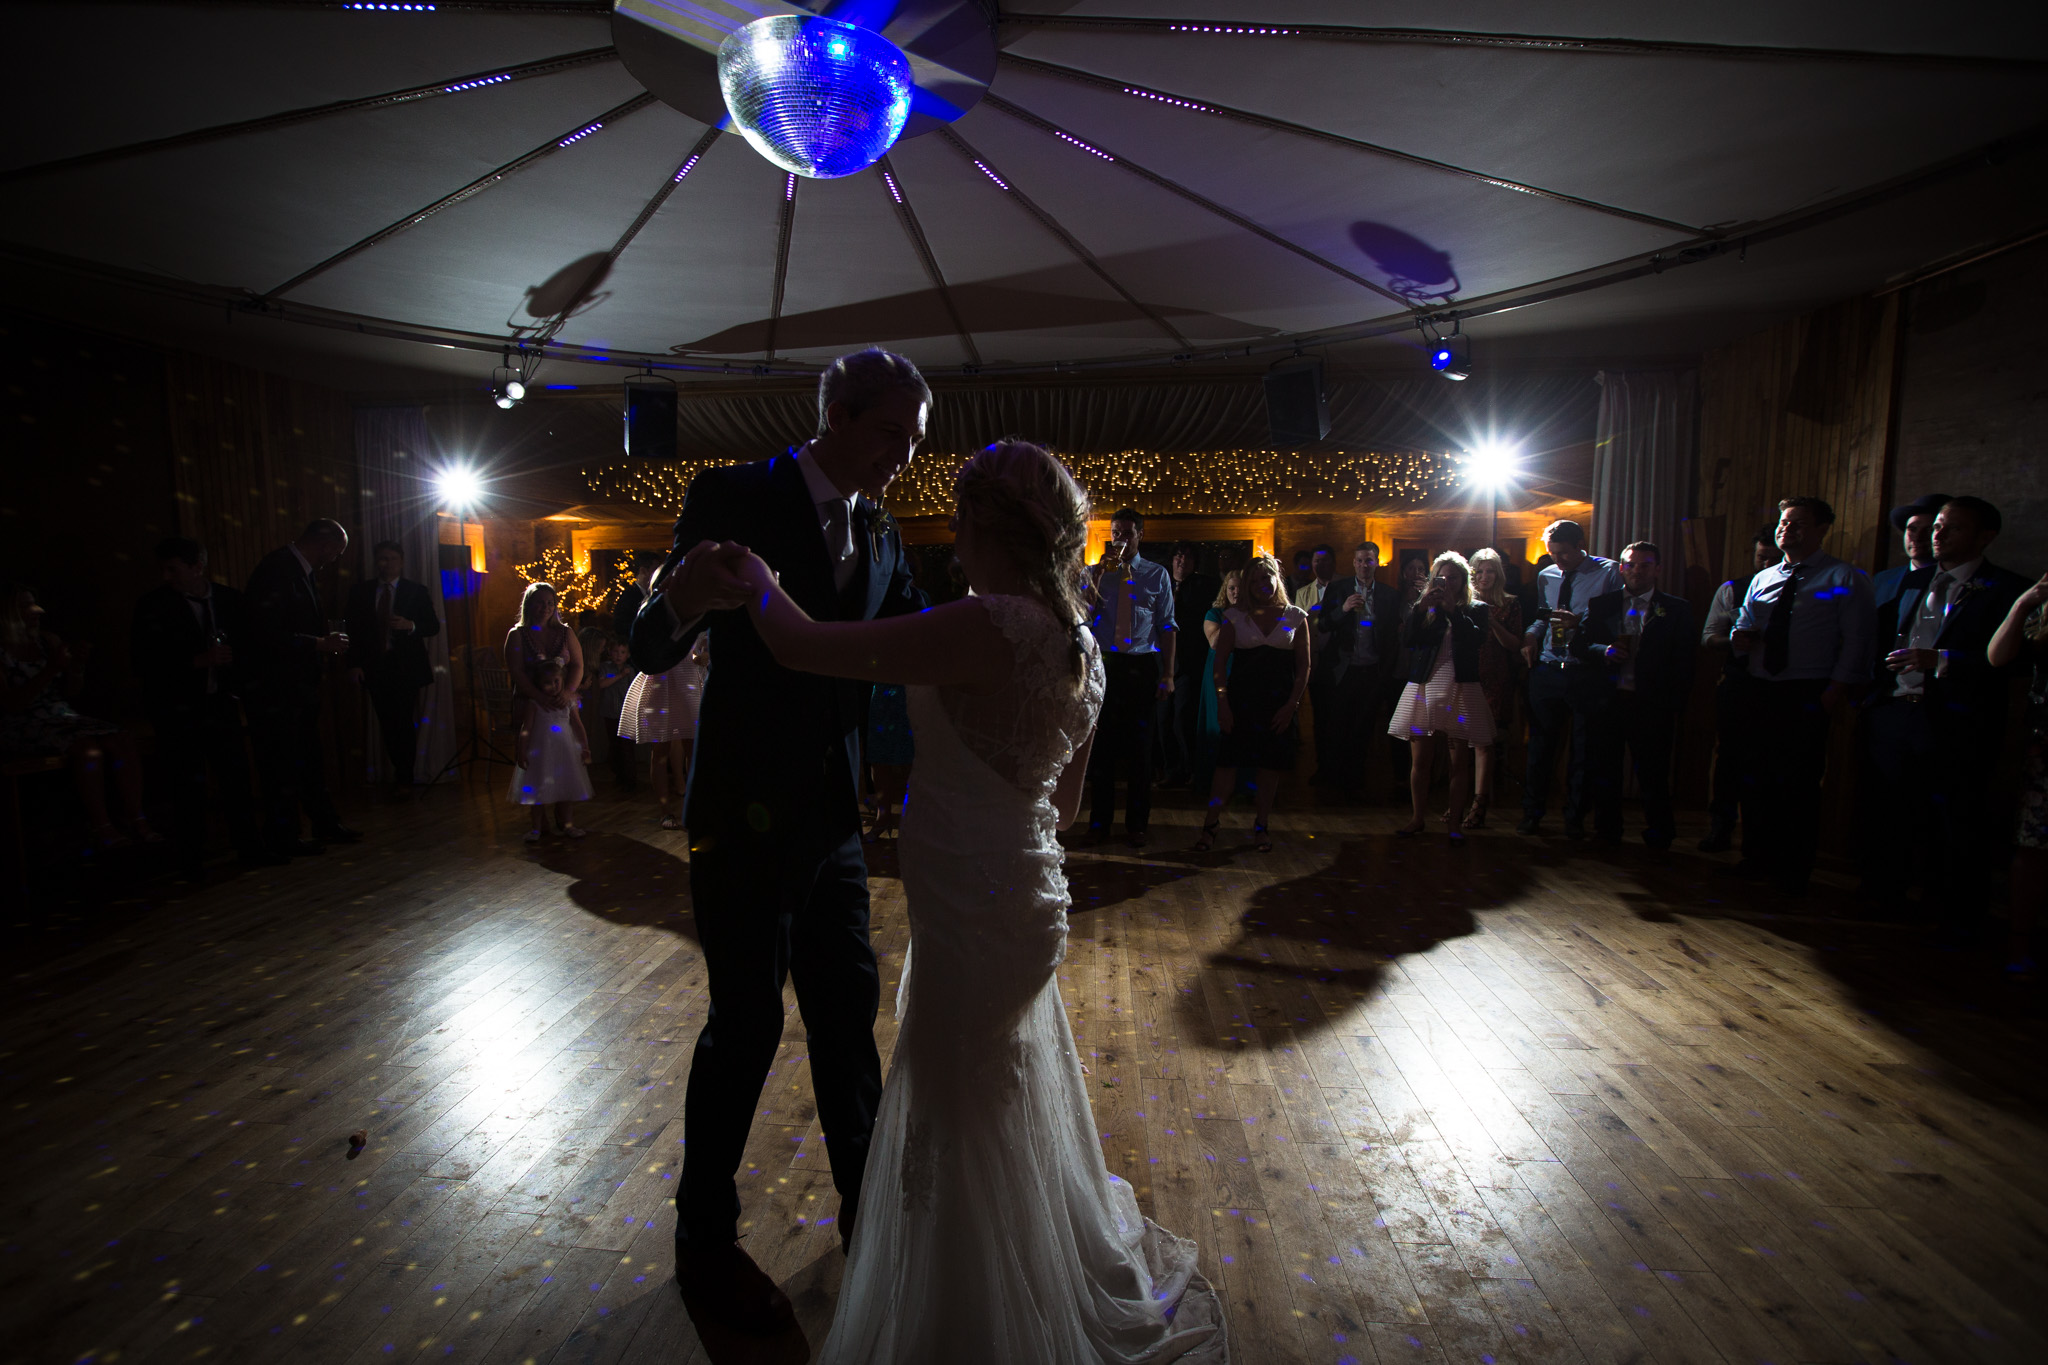 Mark_Barnes_Gloucester_Wedding_Photographer_Elmore_Court_Wedding_Photography_Mike+Kelly-100.jpg